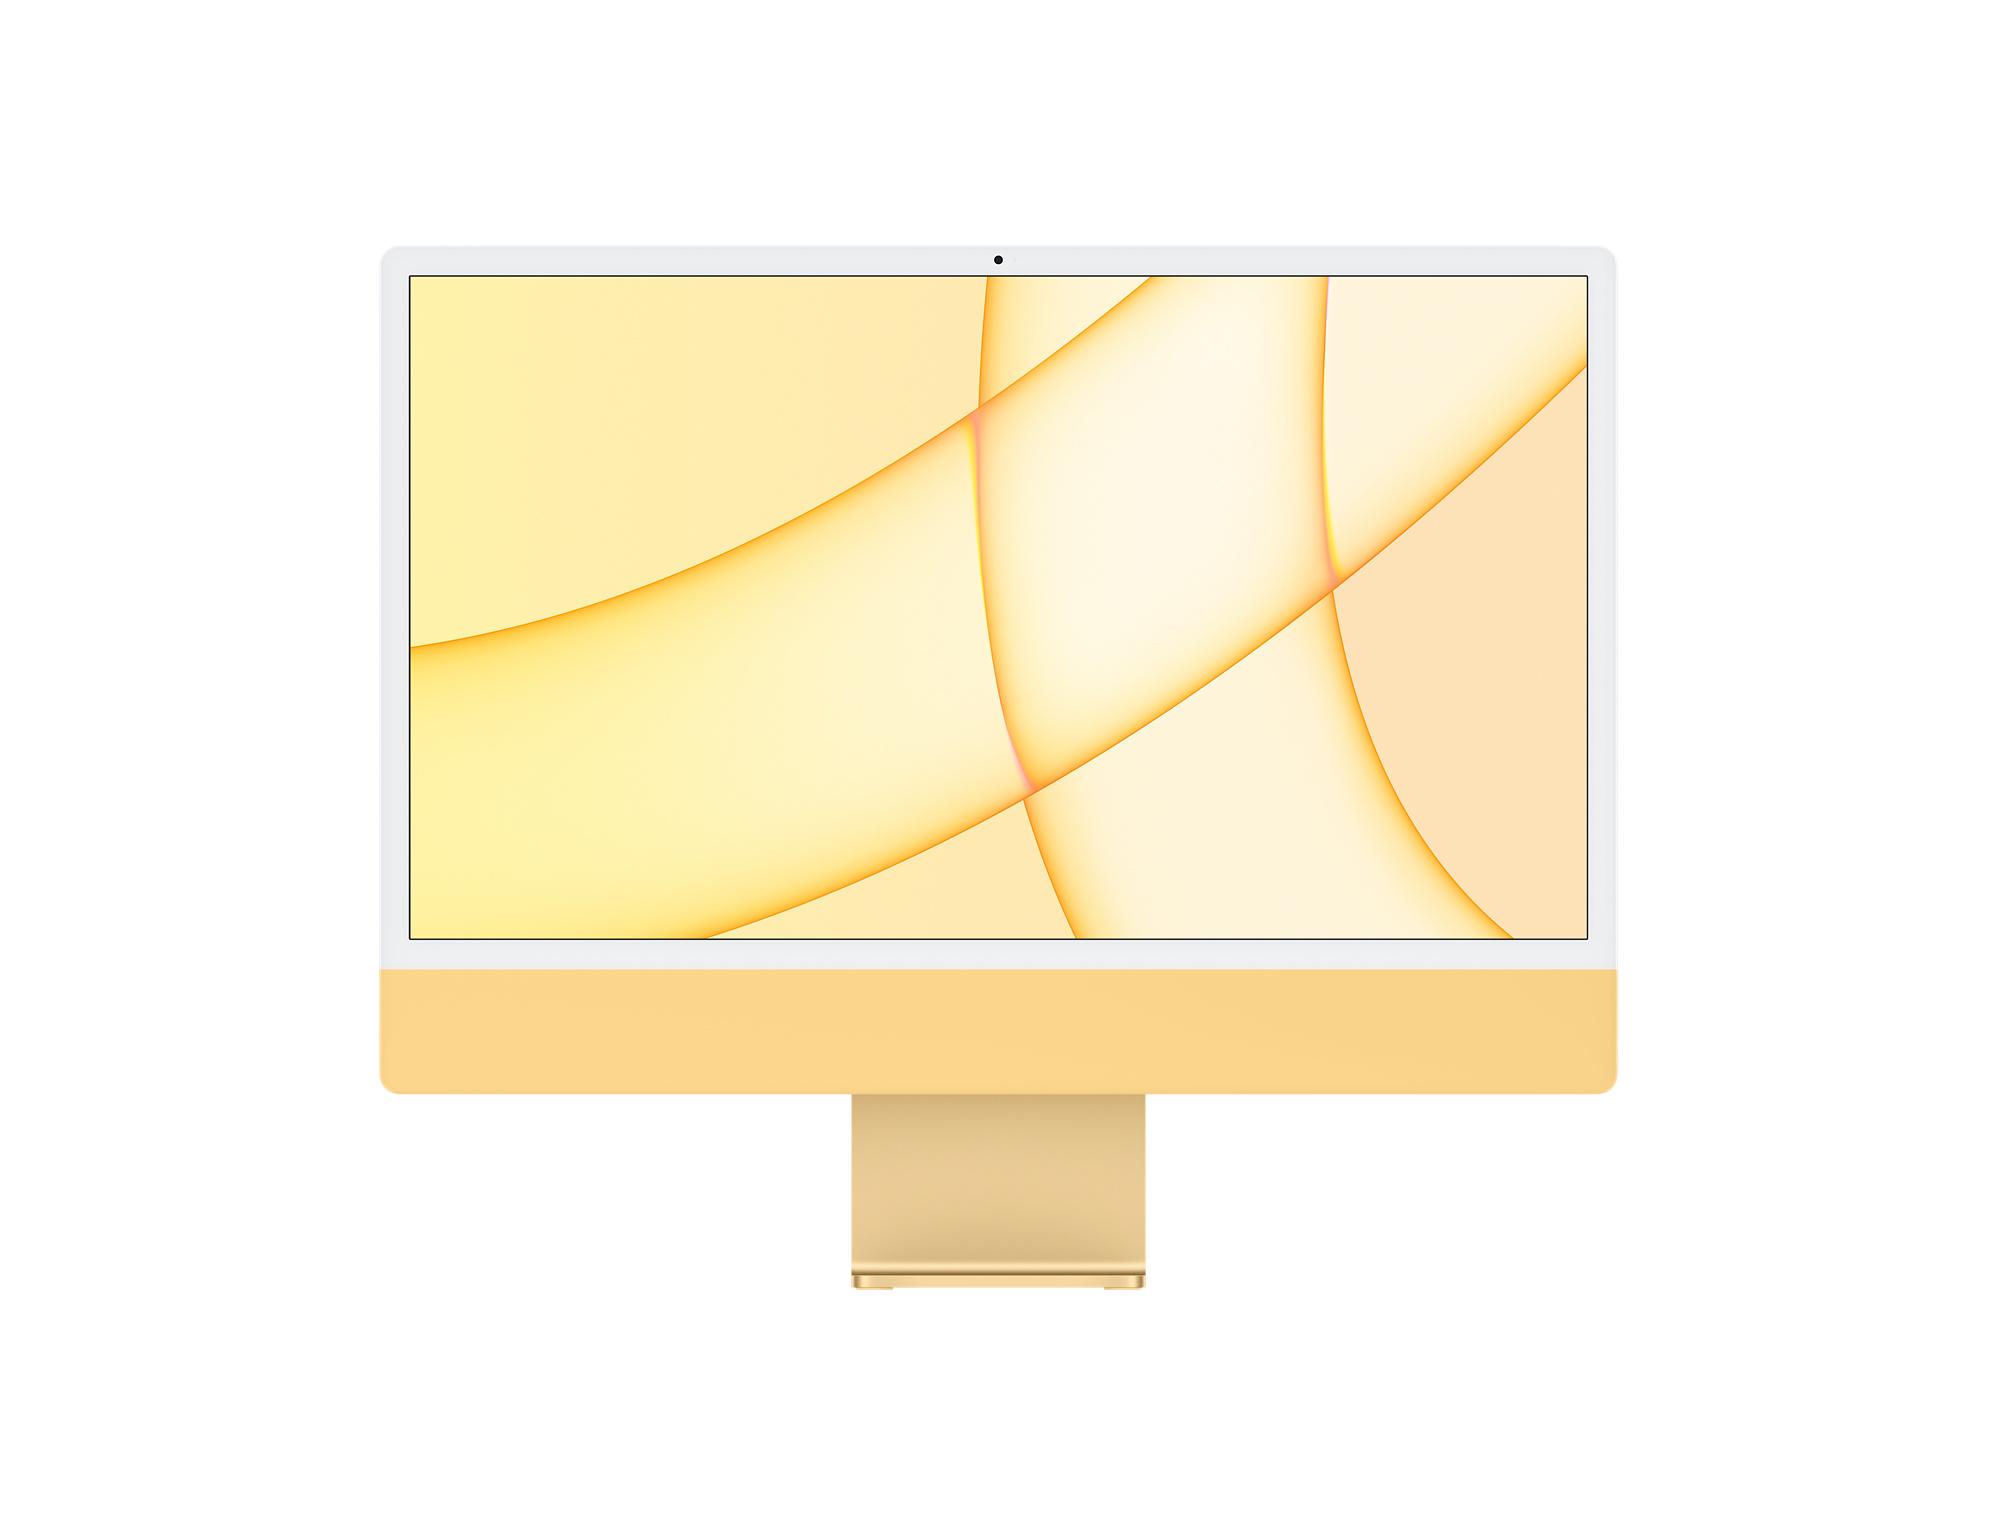 24-inch iMac with Retina 4.5K display | Apple M1 Chip | 512GB | Yellow